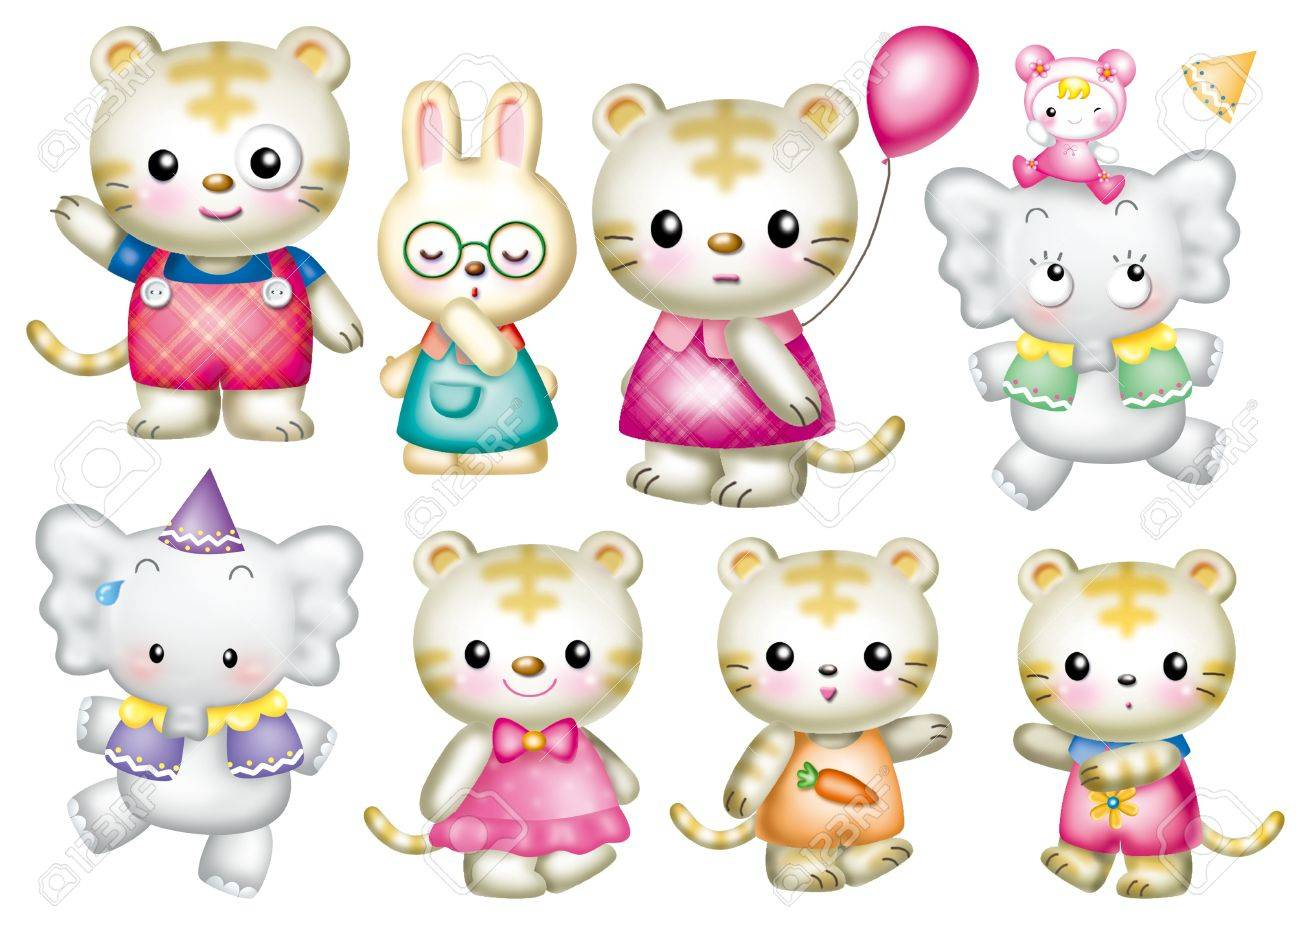 Cute cartoon design elements set - animal Stock Photo - 9530394